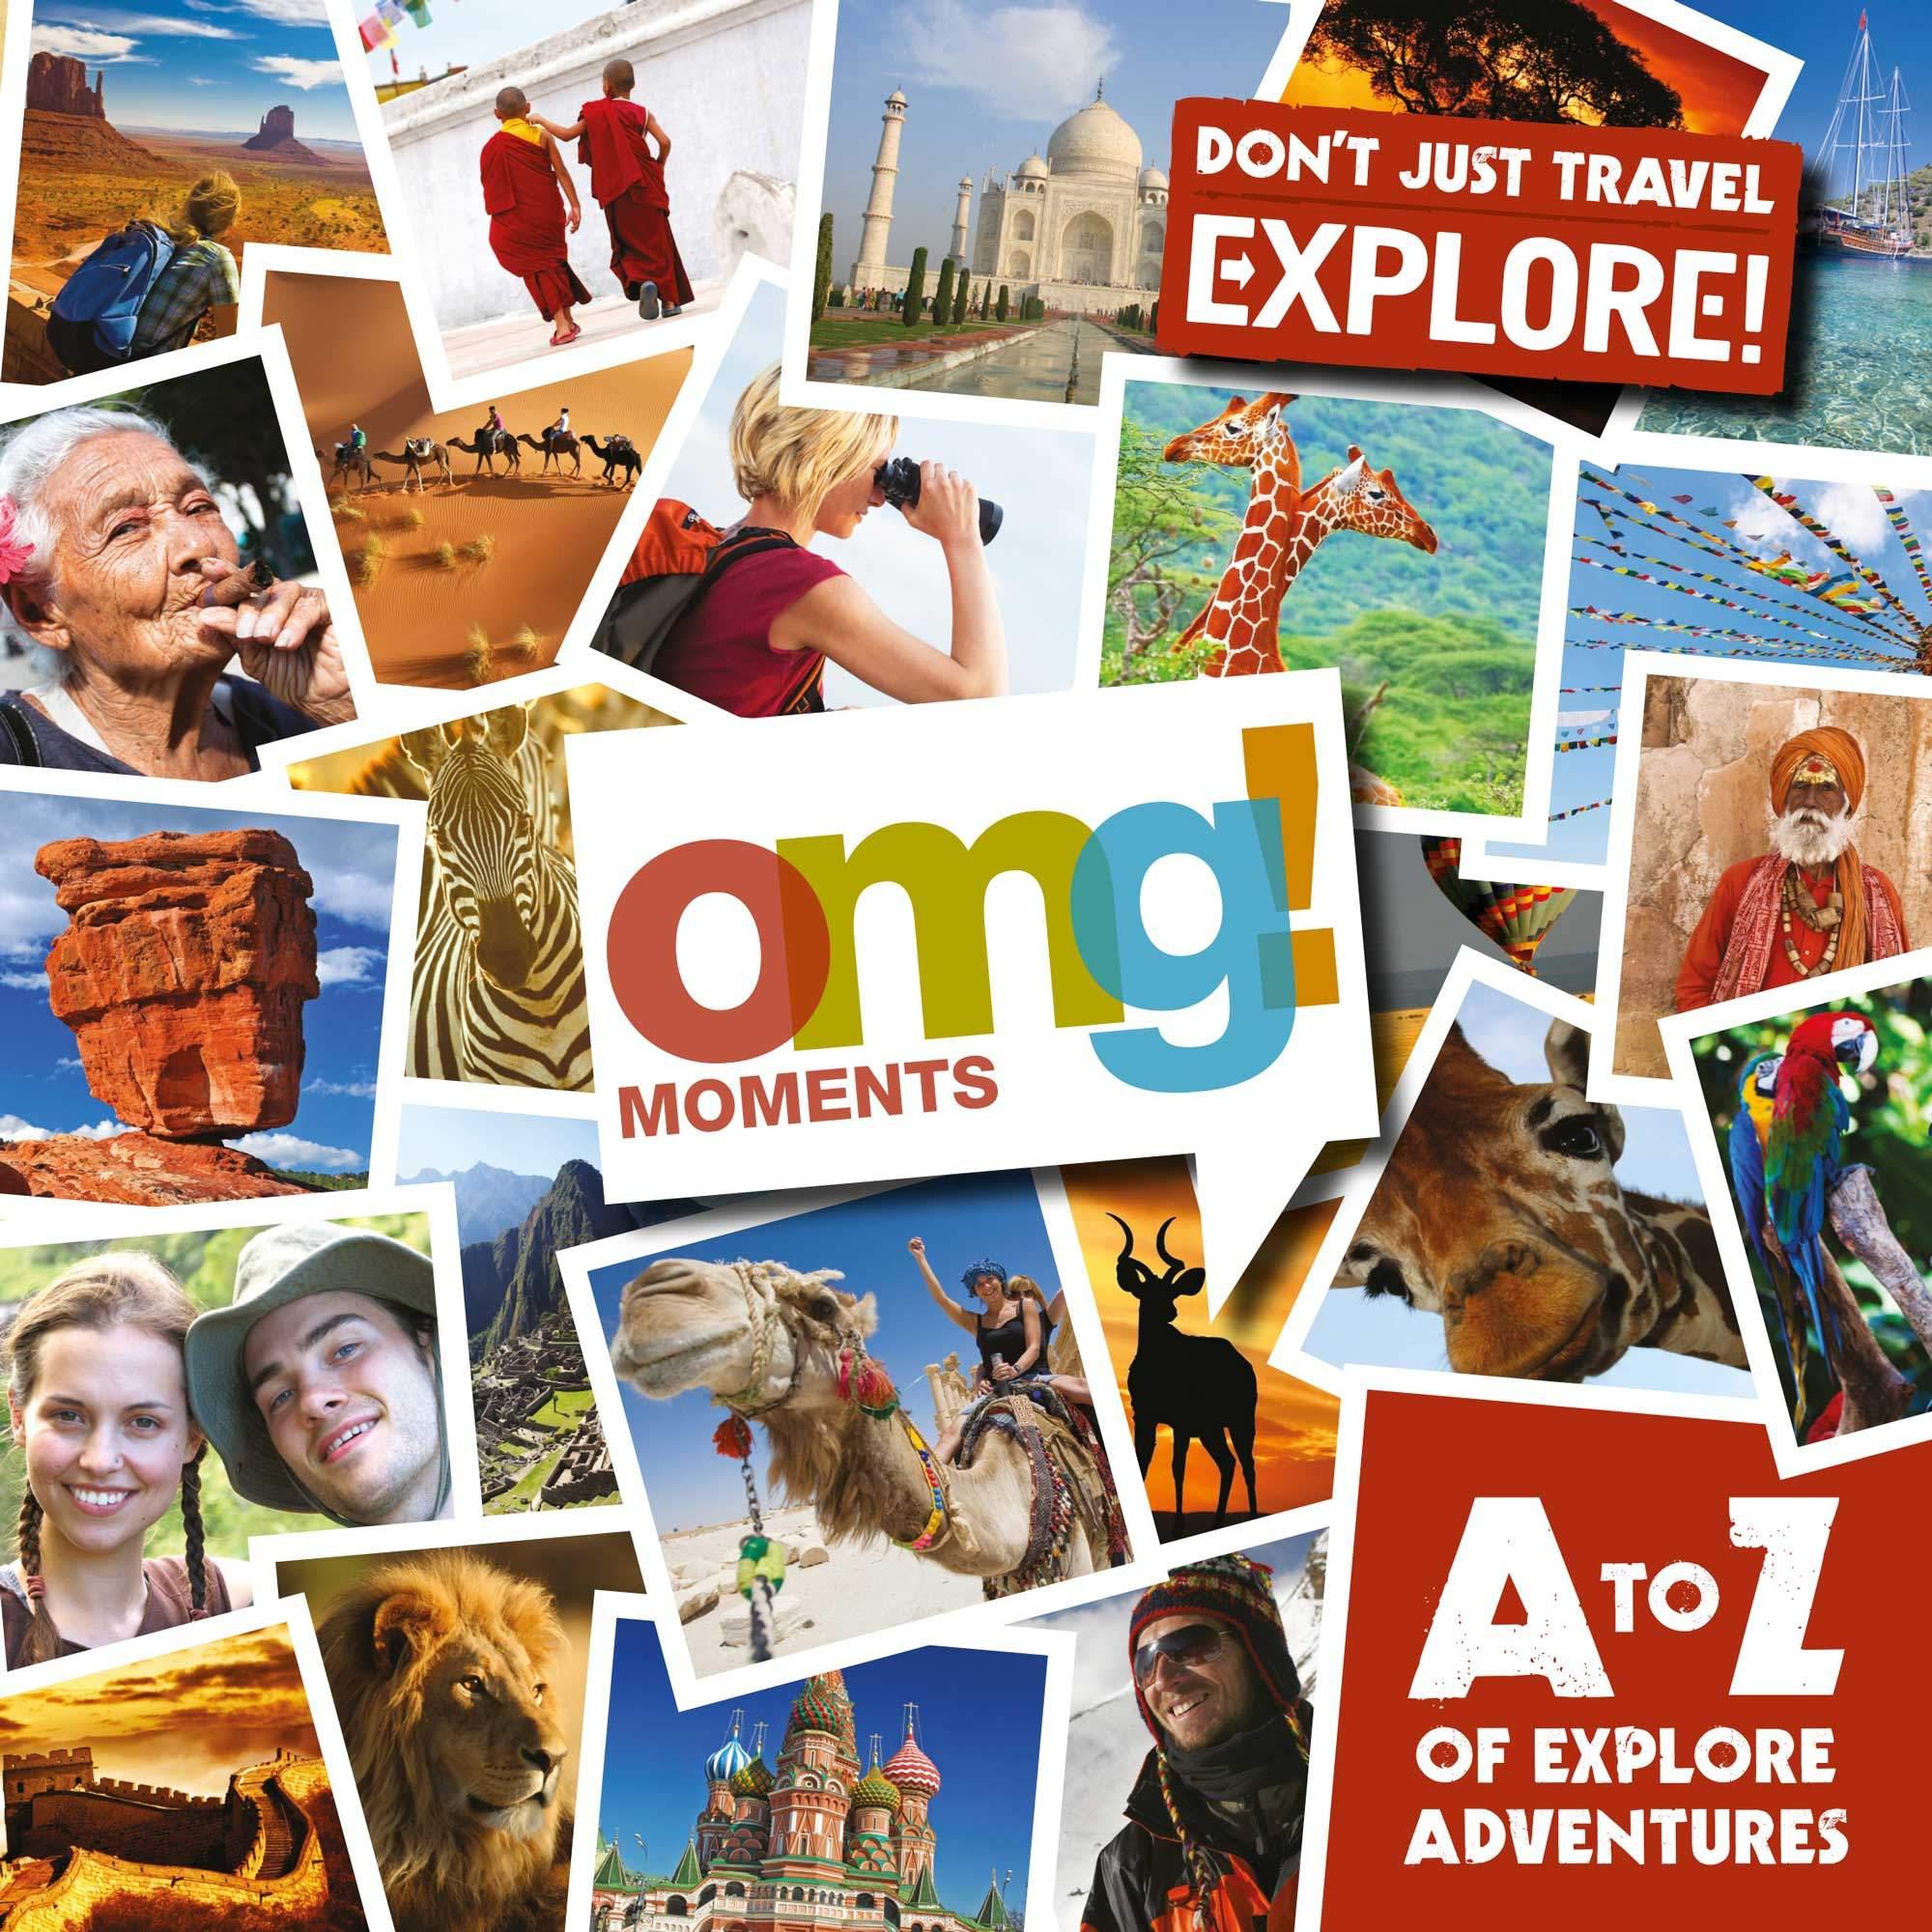 adventure travel brochure design front cover omg marketing campaign